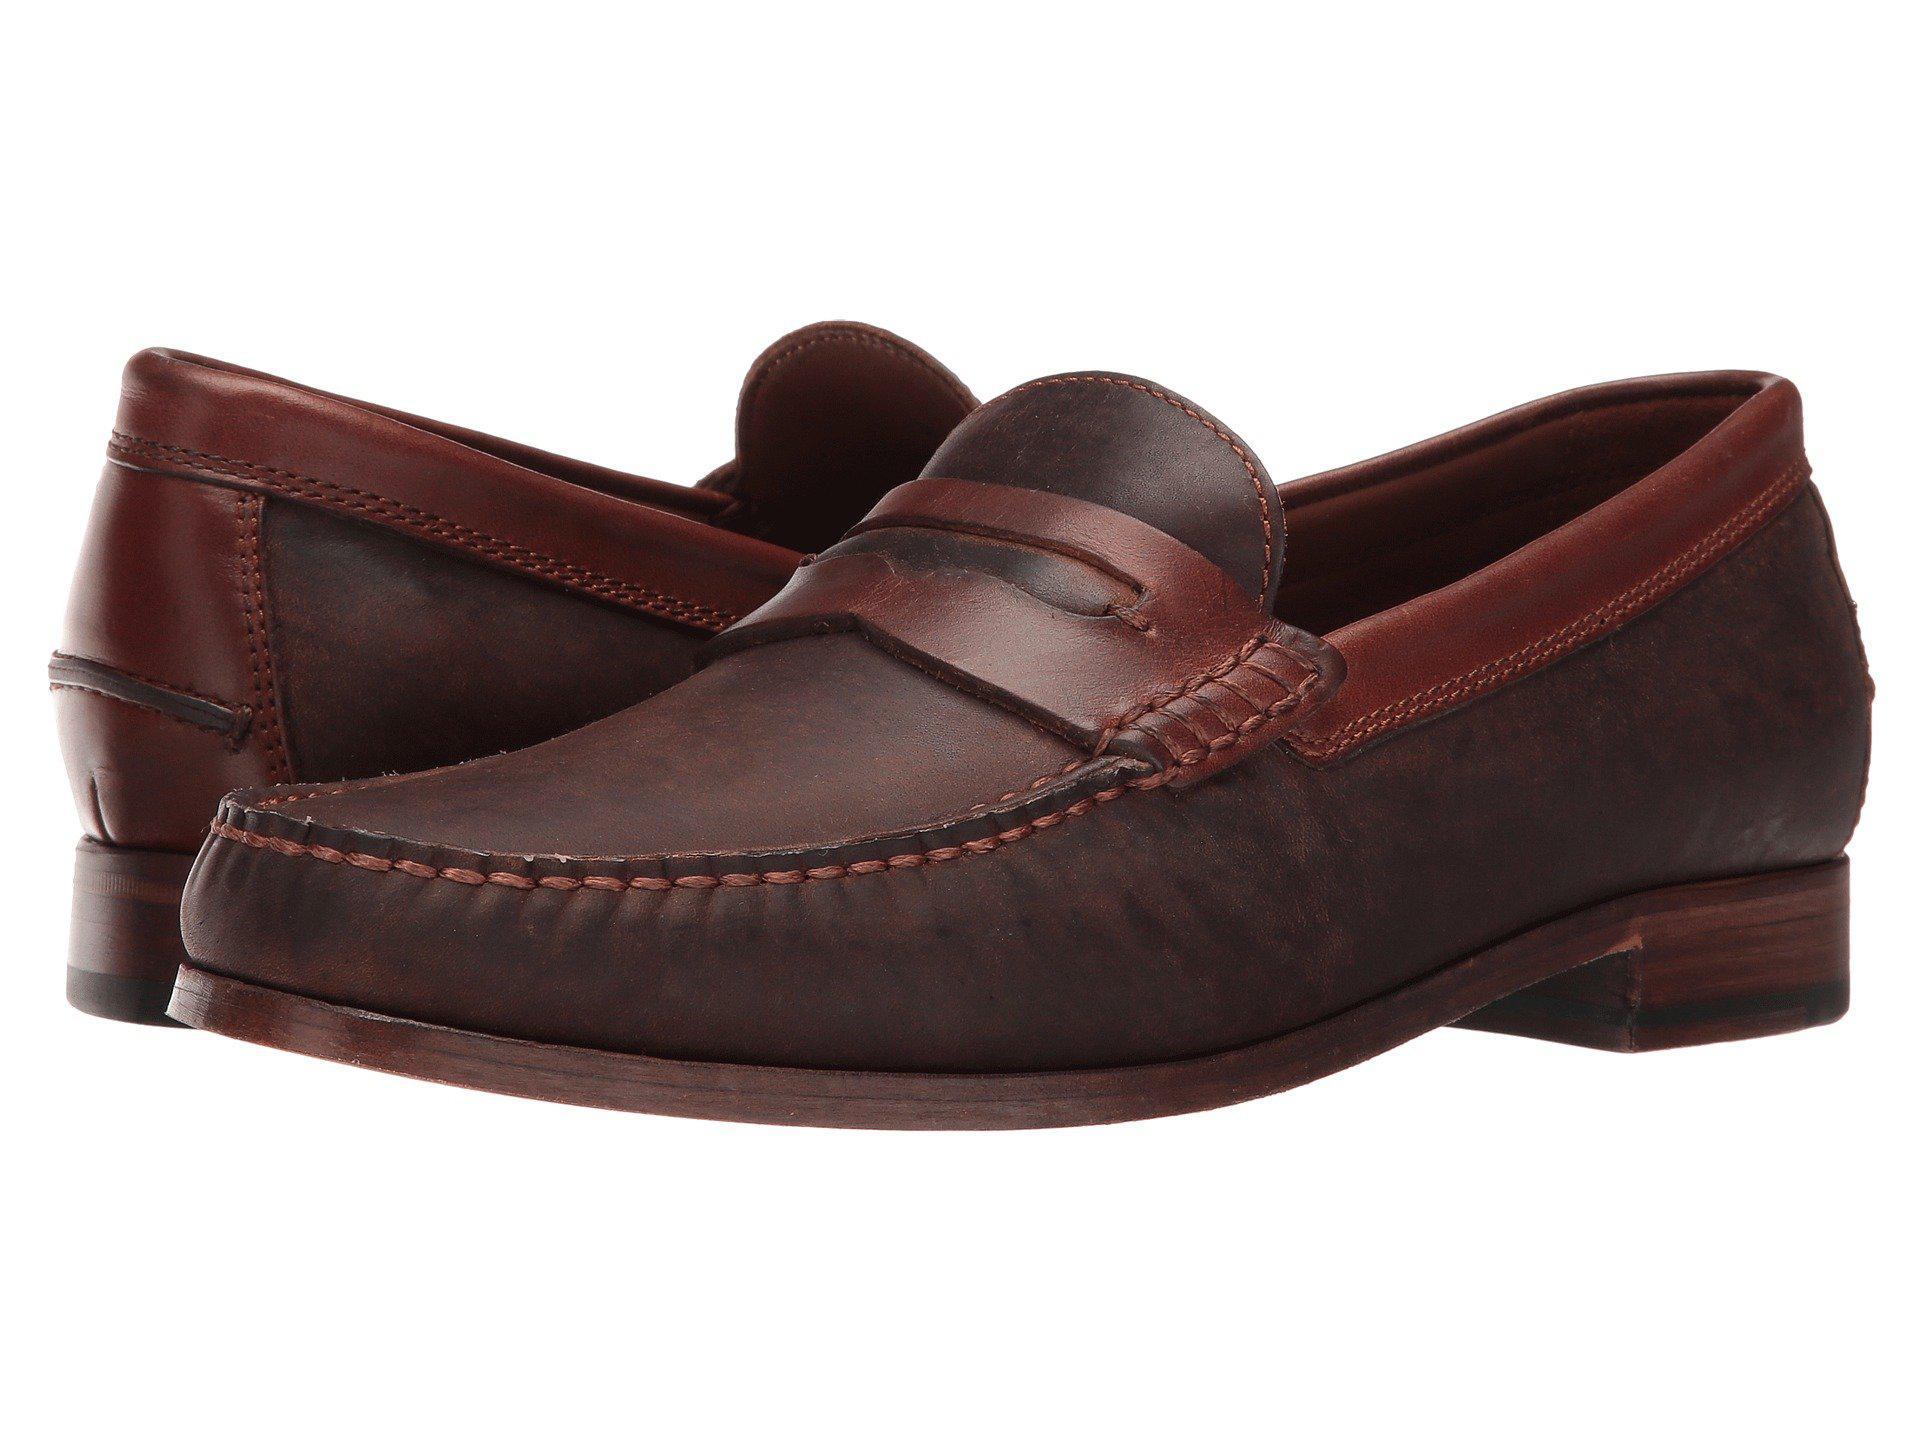 3efddaef52a Lyst - Trask Sadler (snuff English Suede) Men s Slip On Shoes in ...